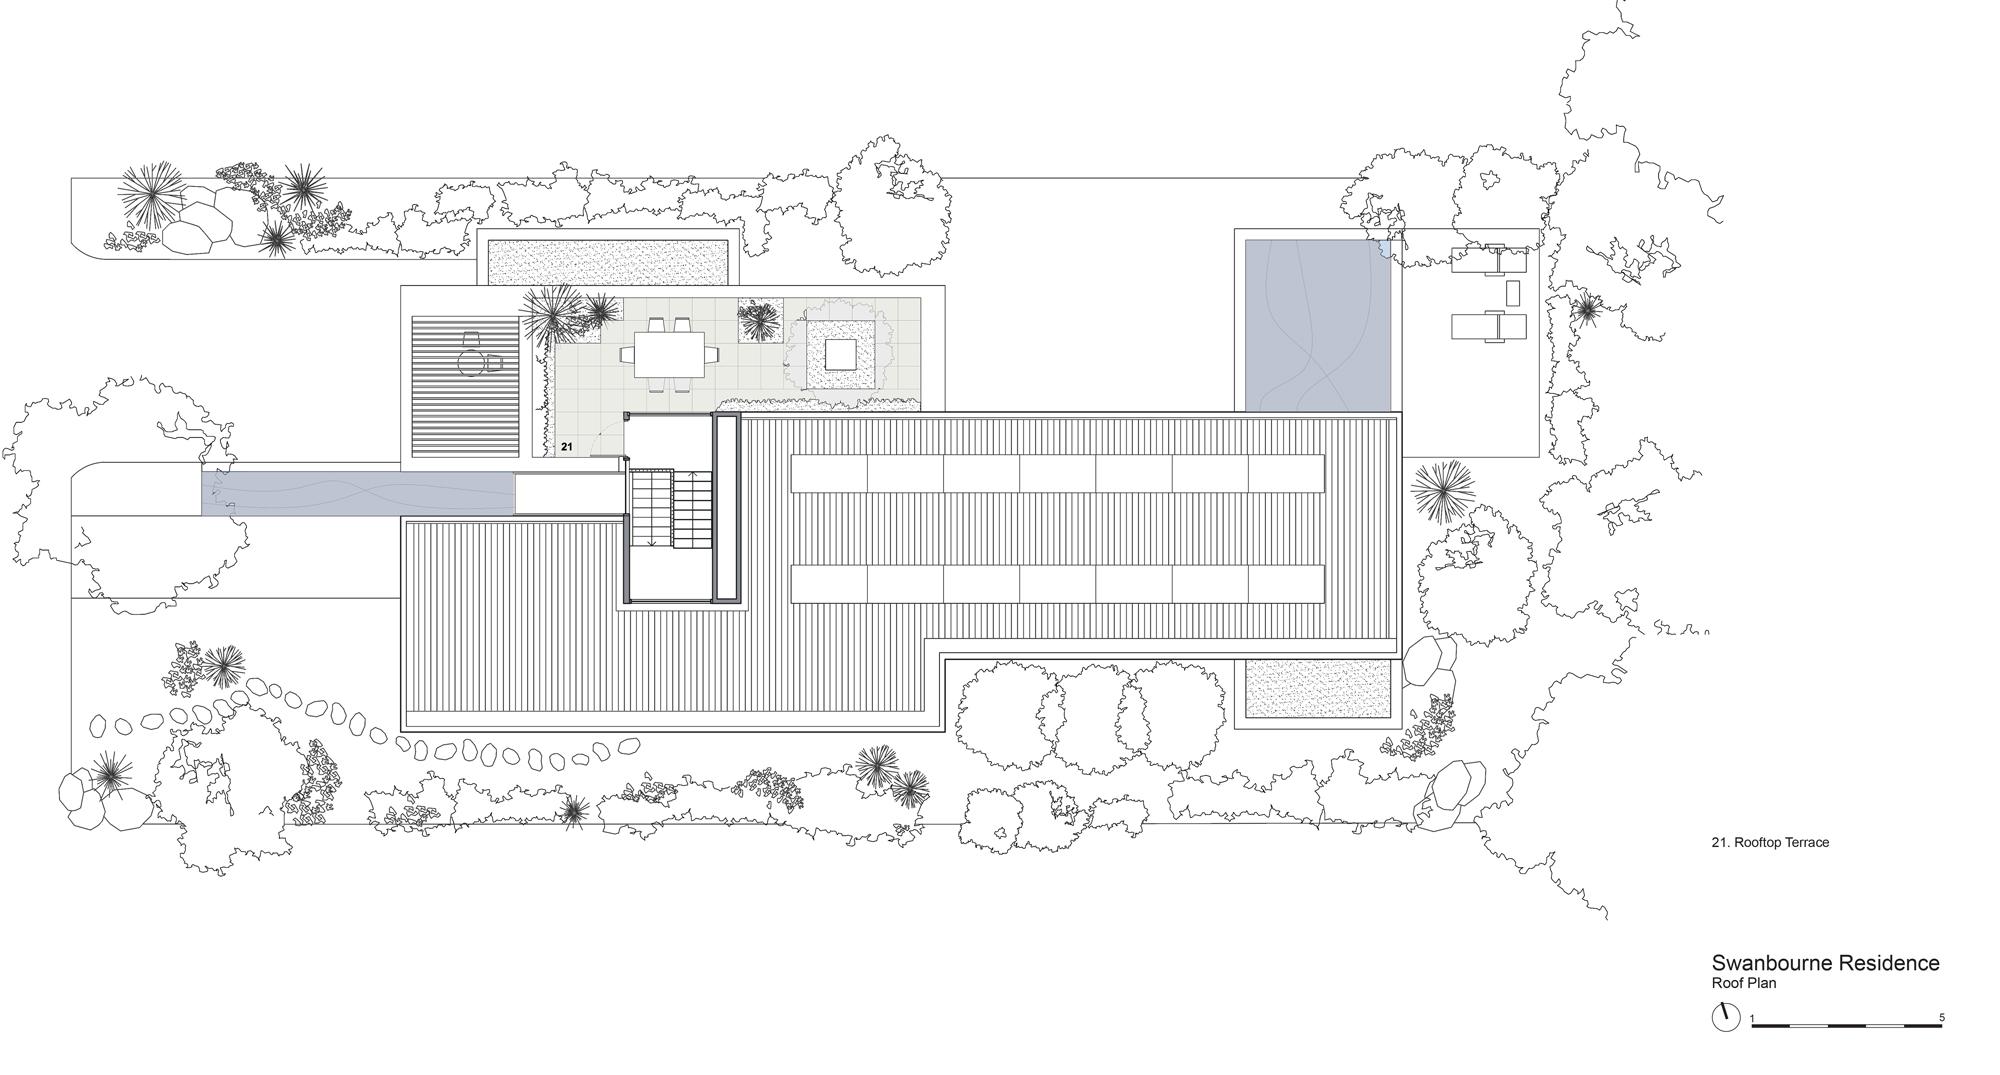 BrahamArchitects_NarlaRoad_RoofPlan.jpg